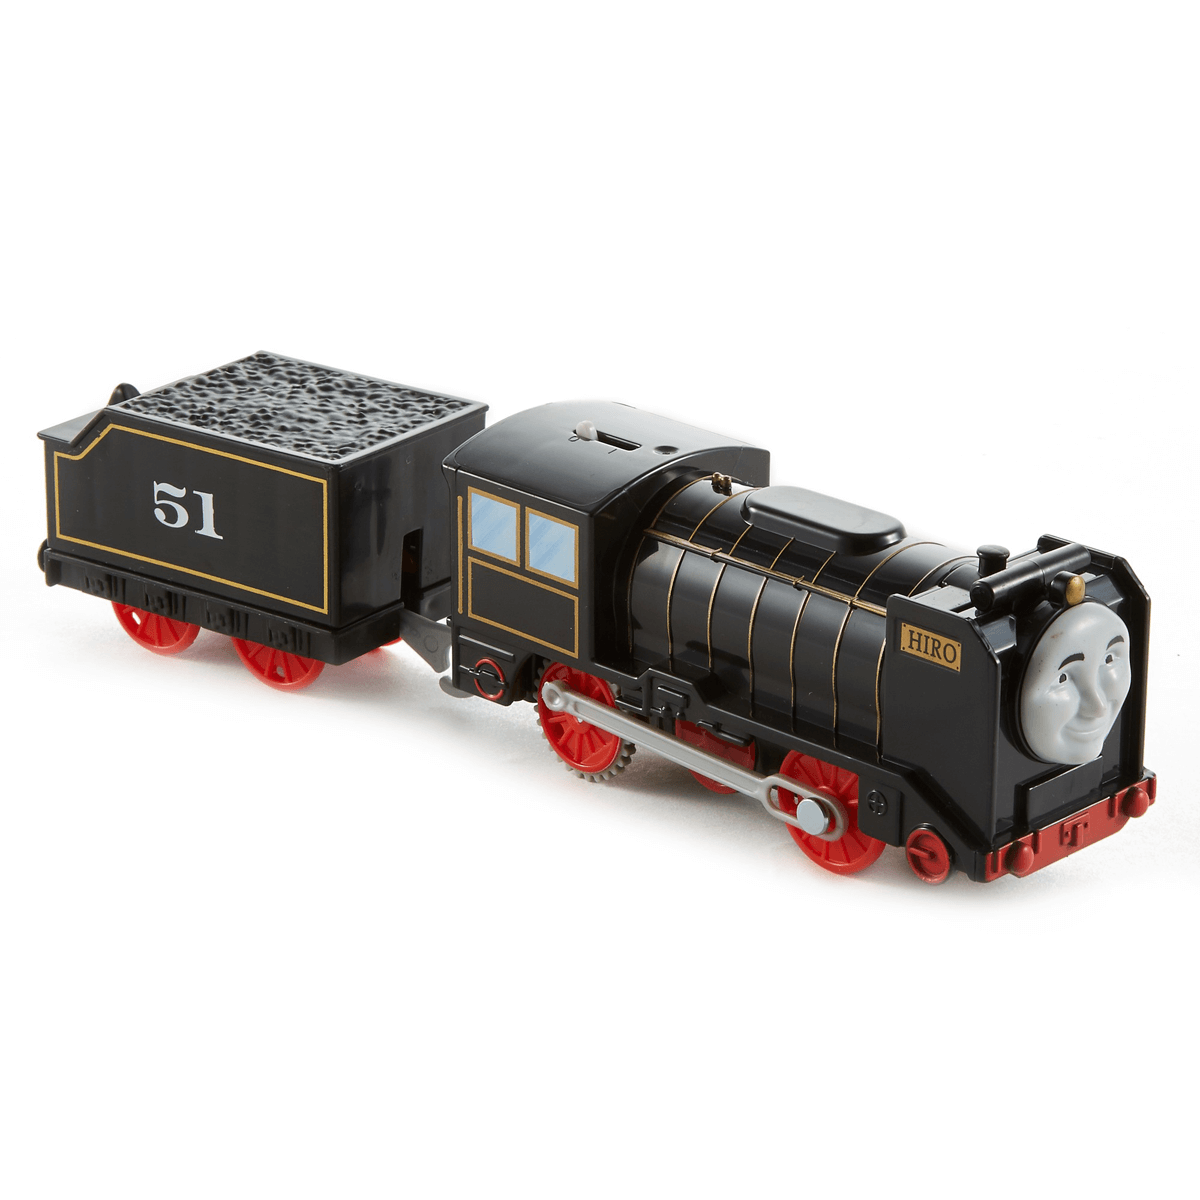 Fisher-Price Thomas & Friends - TrackMaster Motorised Hiro Train Engine